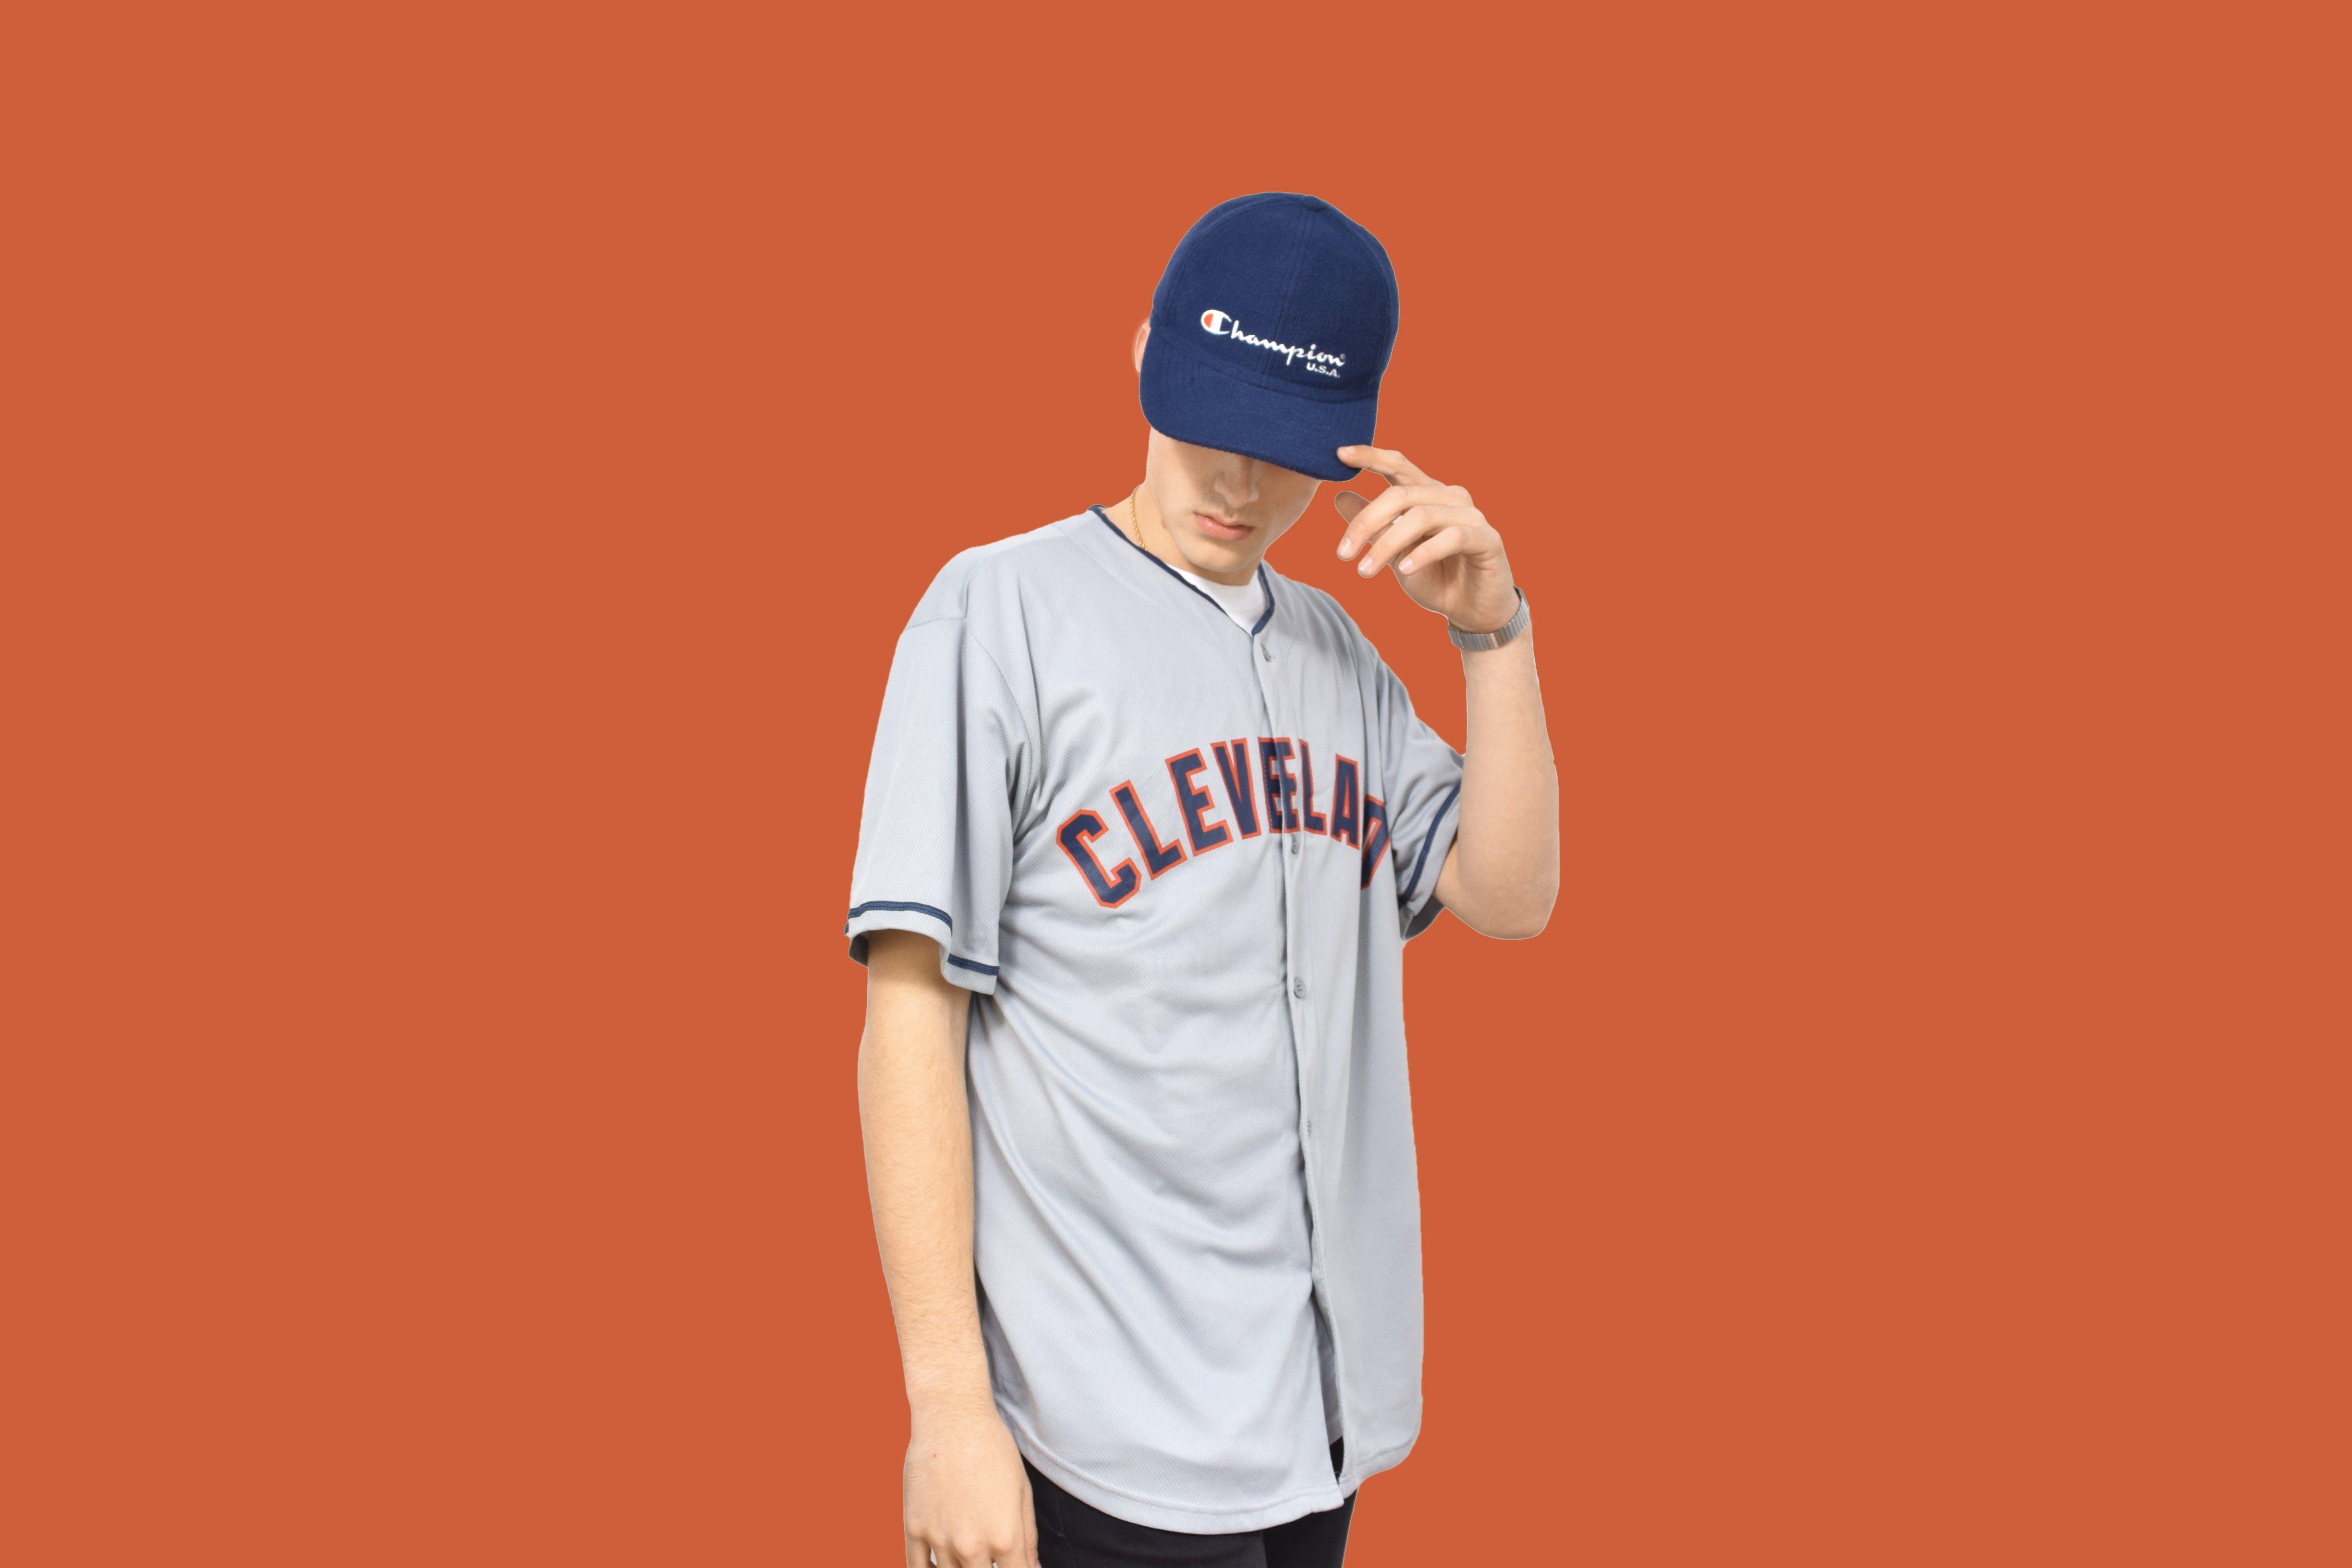 dea7aa72d Camisa béisbol CLEVELAND. Ropa americana vintage. Gorra Champion azul. Ropa  vintage. Kaamul